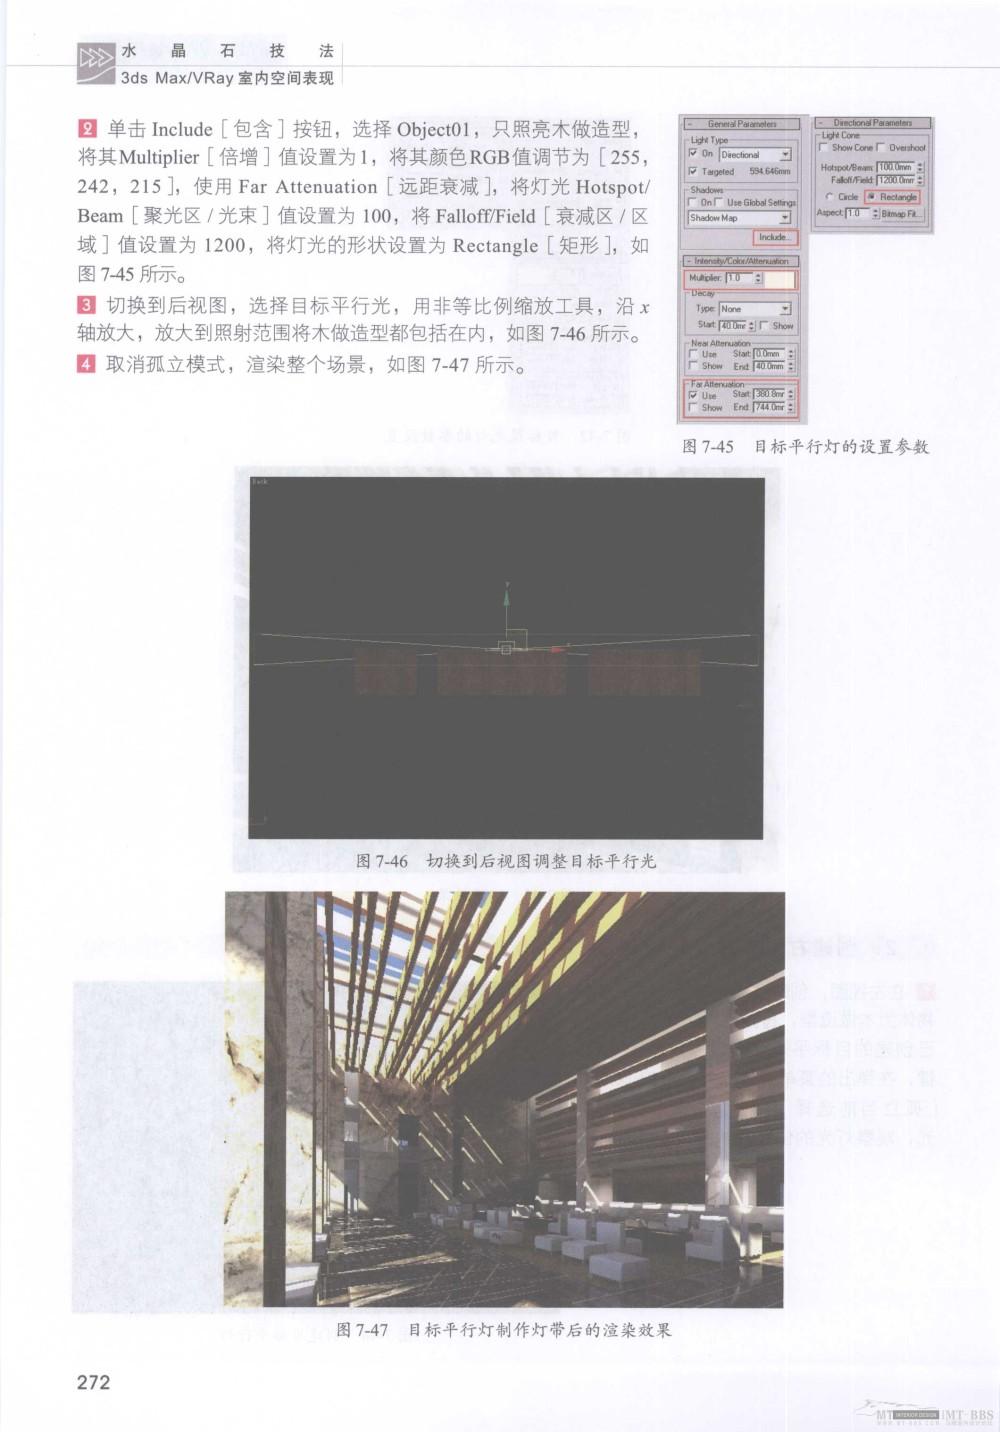 水晶石技法-3ds_Max&VRay室内空间表现_水晶石技法-3ds_Max&VRay室内空间表现_页面_278.jpg